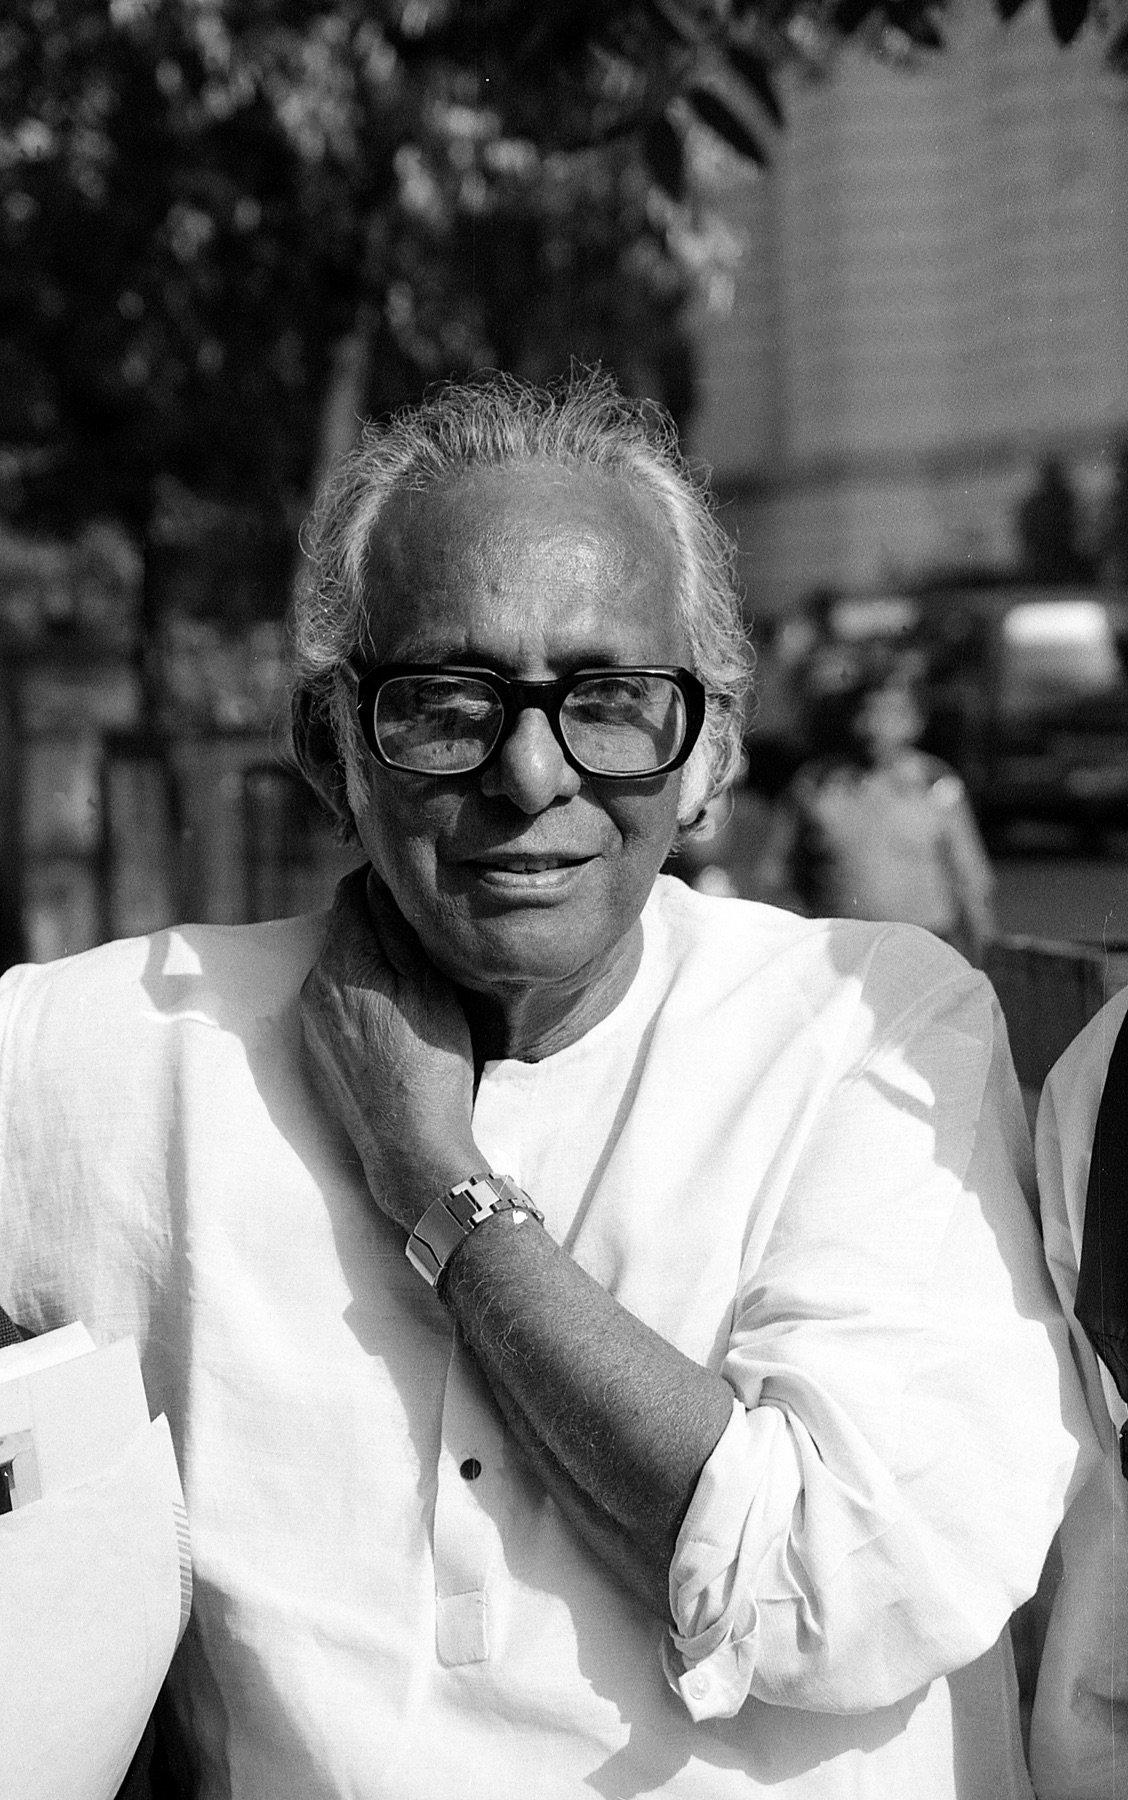 Remembering Mrinal Sen's legacy | Media India Group